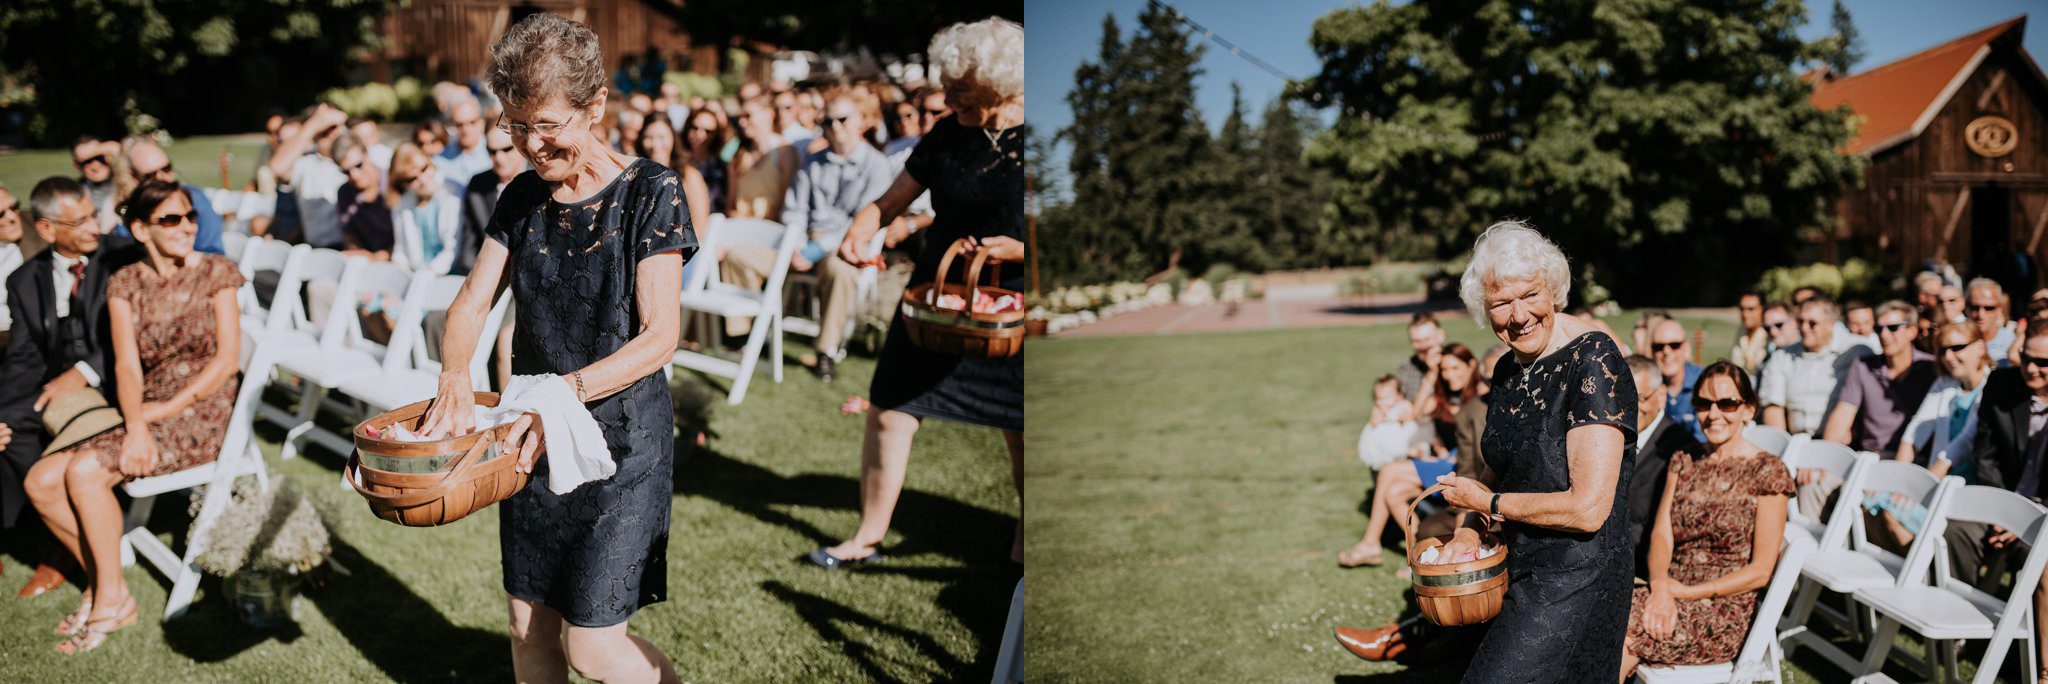 kristen-and-cody-the-kelley-farm-wedding-seattle-photographer-caitlyn-nikula-60.jpg